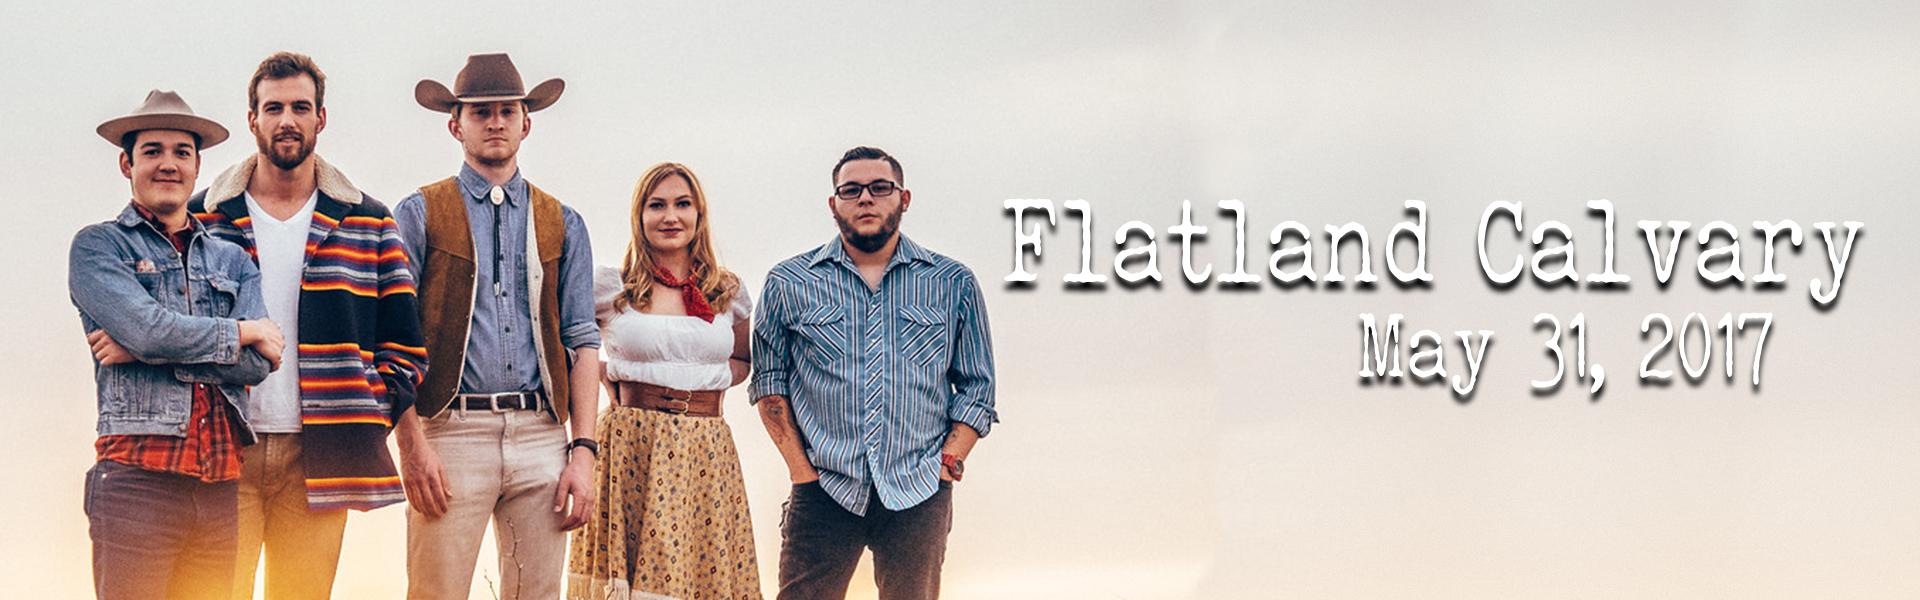 Flatland-Calvary-Banner-Project-2